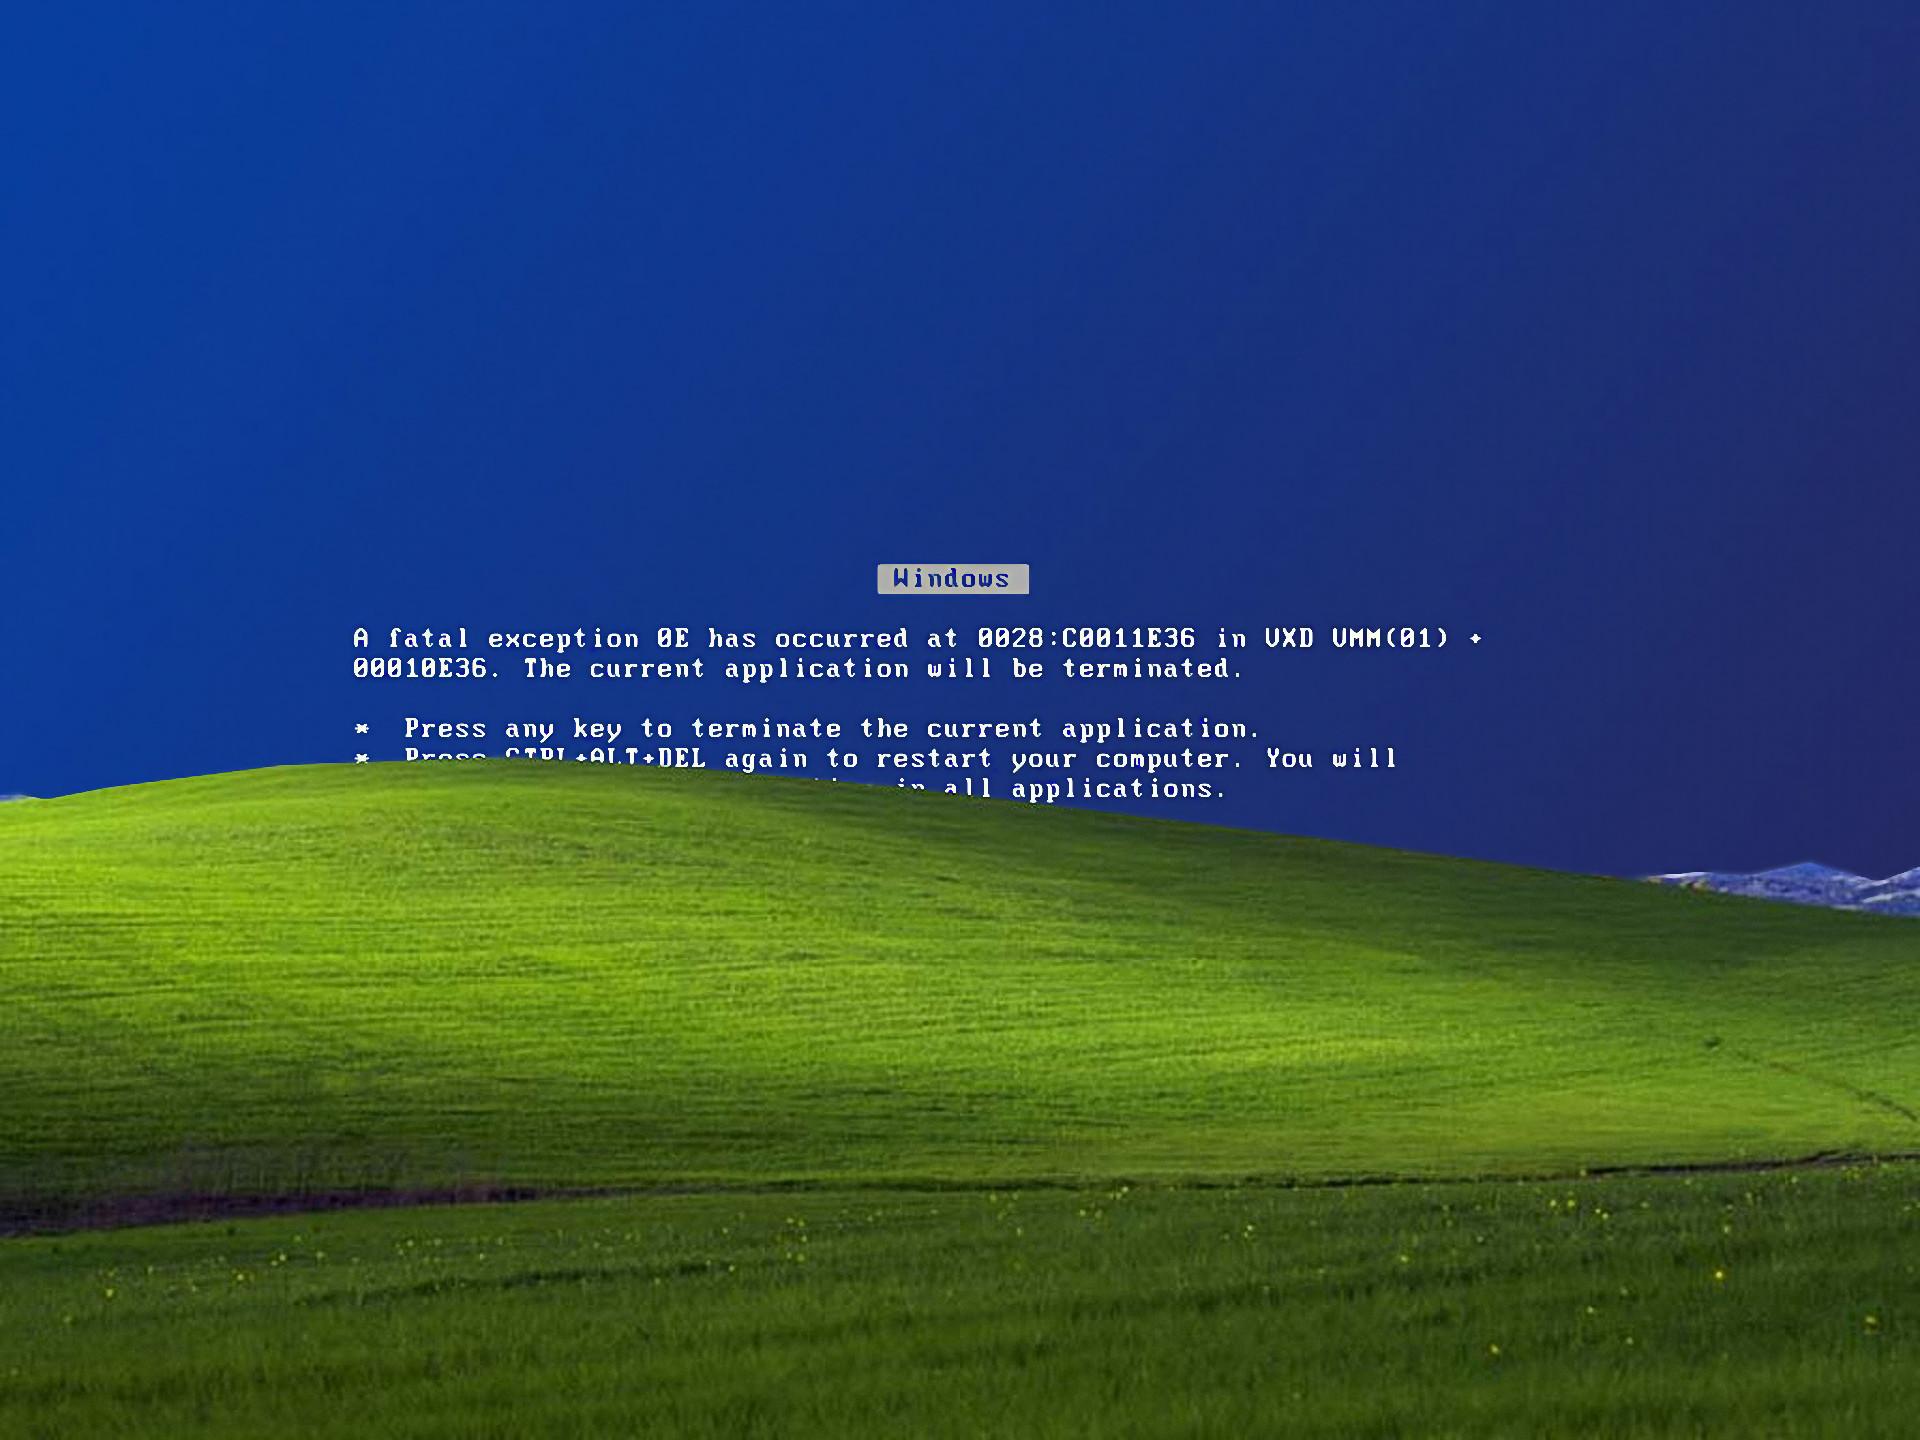 Windows XP error Microsoft Windows Blue Screen of Death wallpaper .